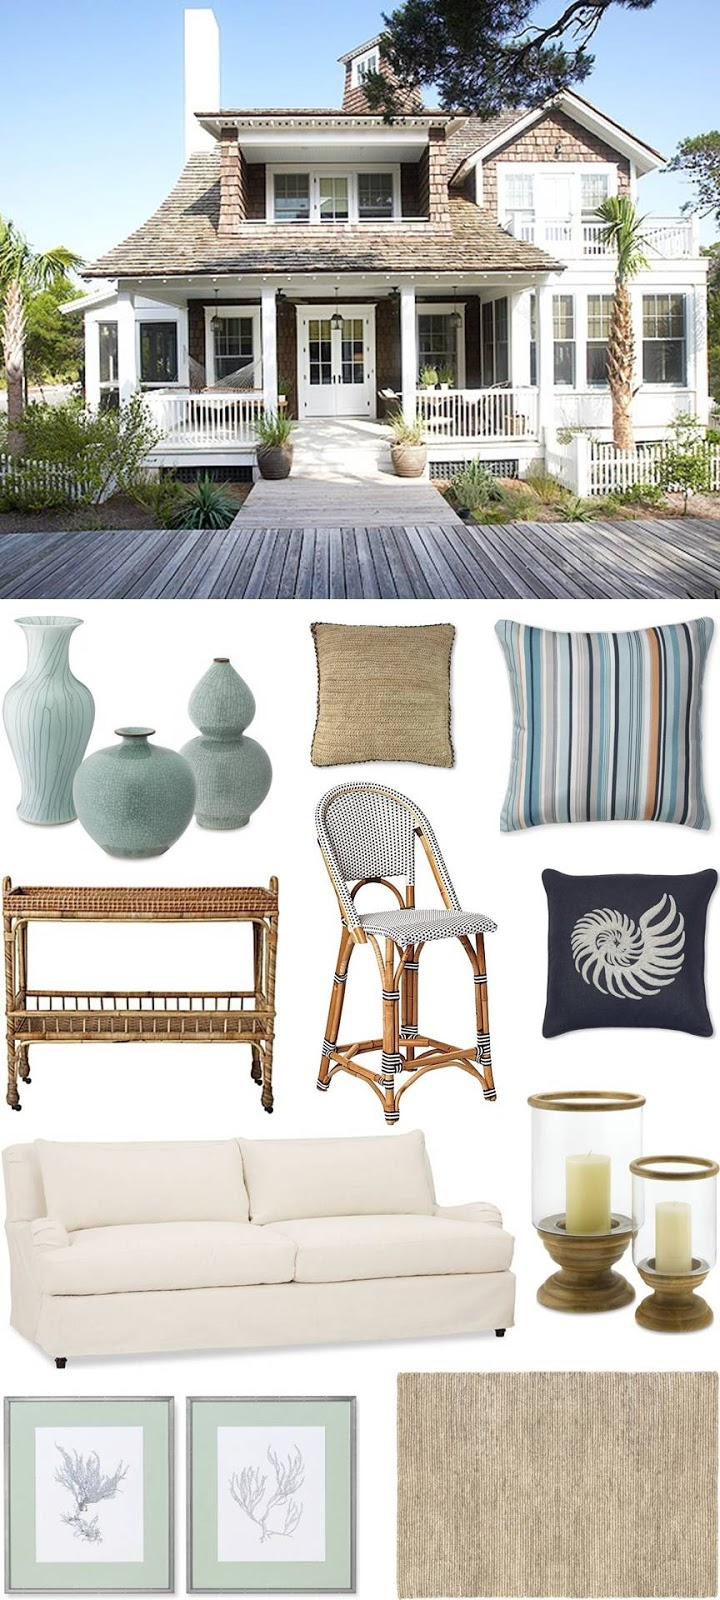 coastal style hamptons beach house get the look. Black Bedroom Furniture Sets. Home Design Ideas